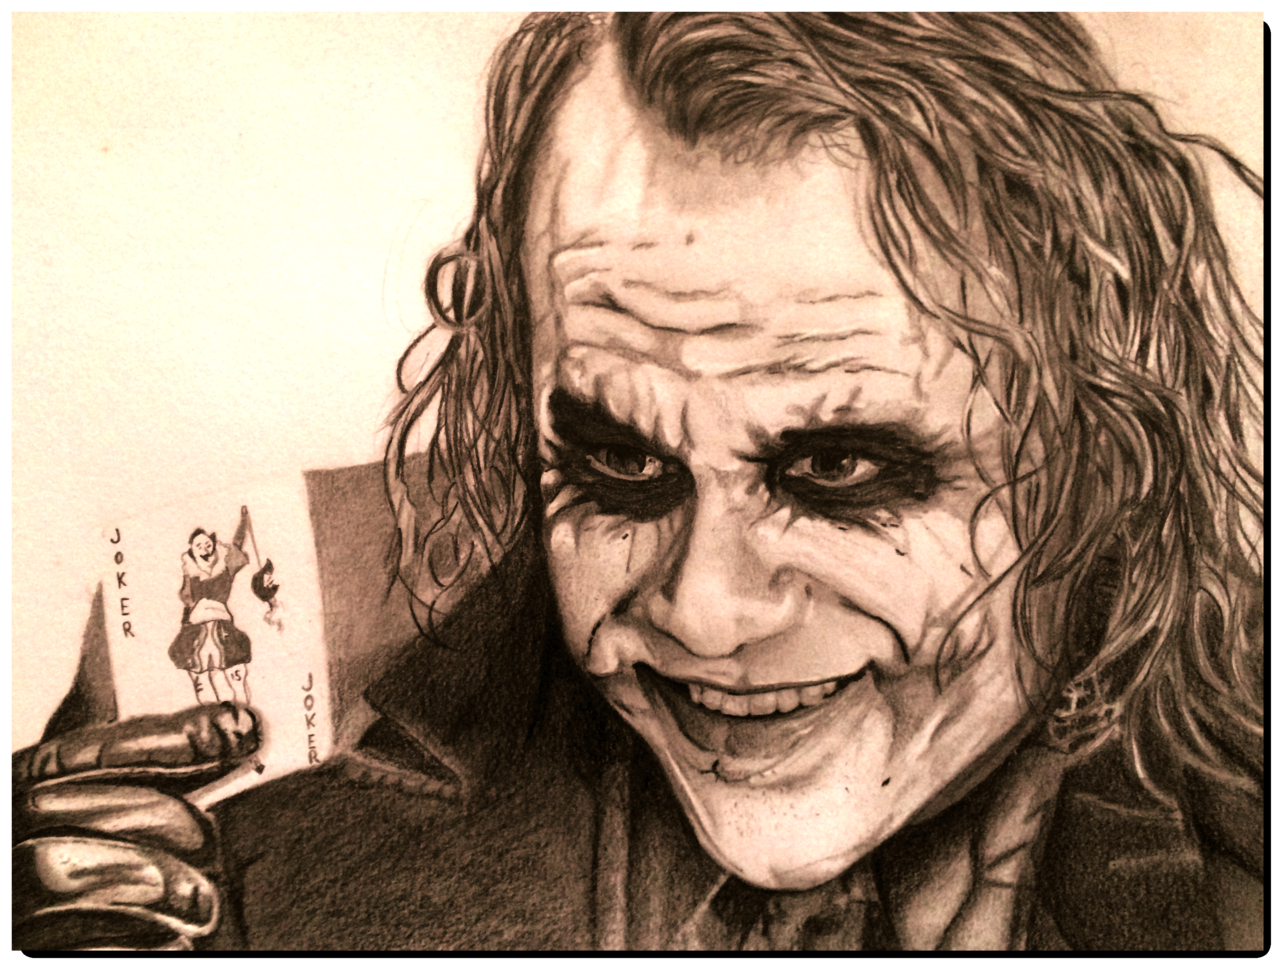 joker heath ledger joker zeichnung portrait. Black Bedroom Furniture Sets. Home Design Ideas